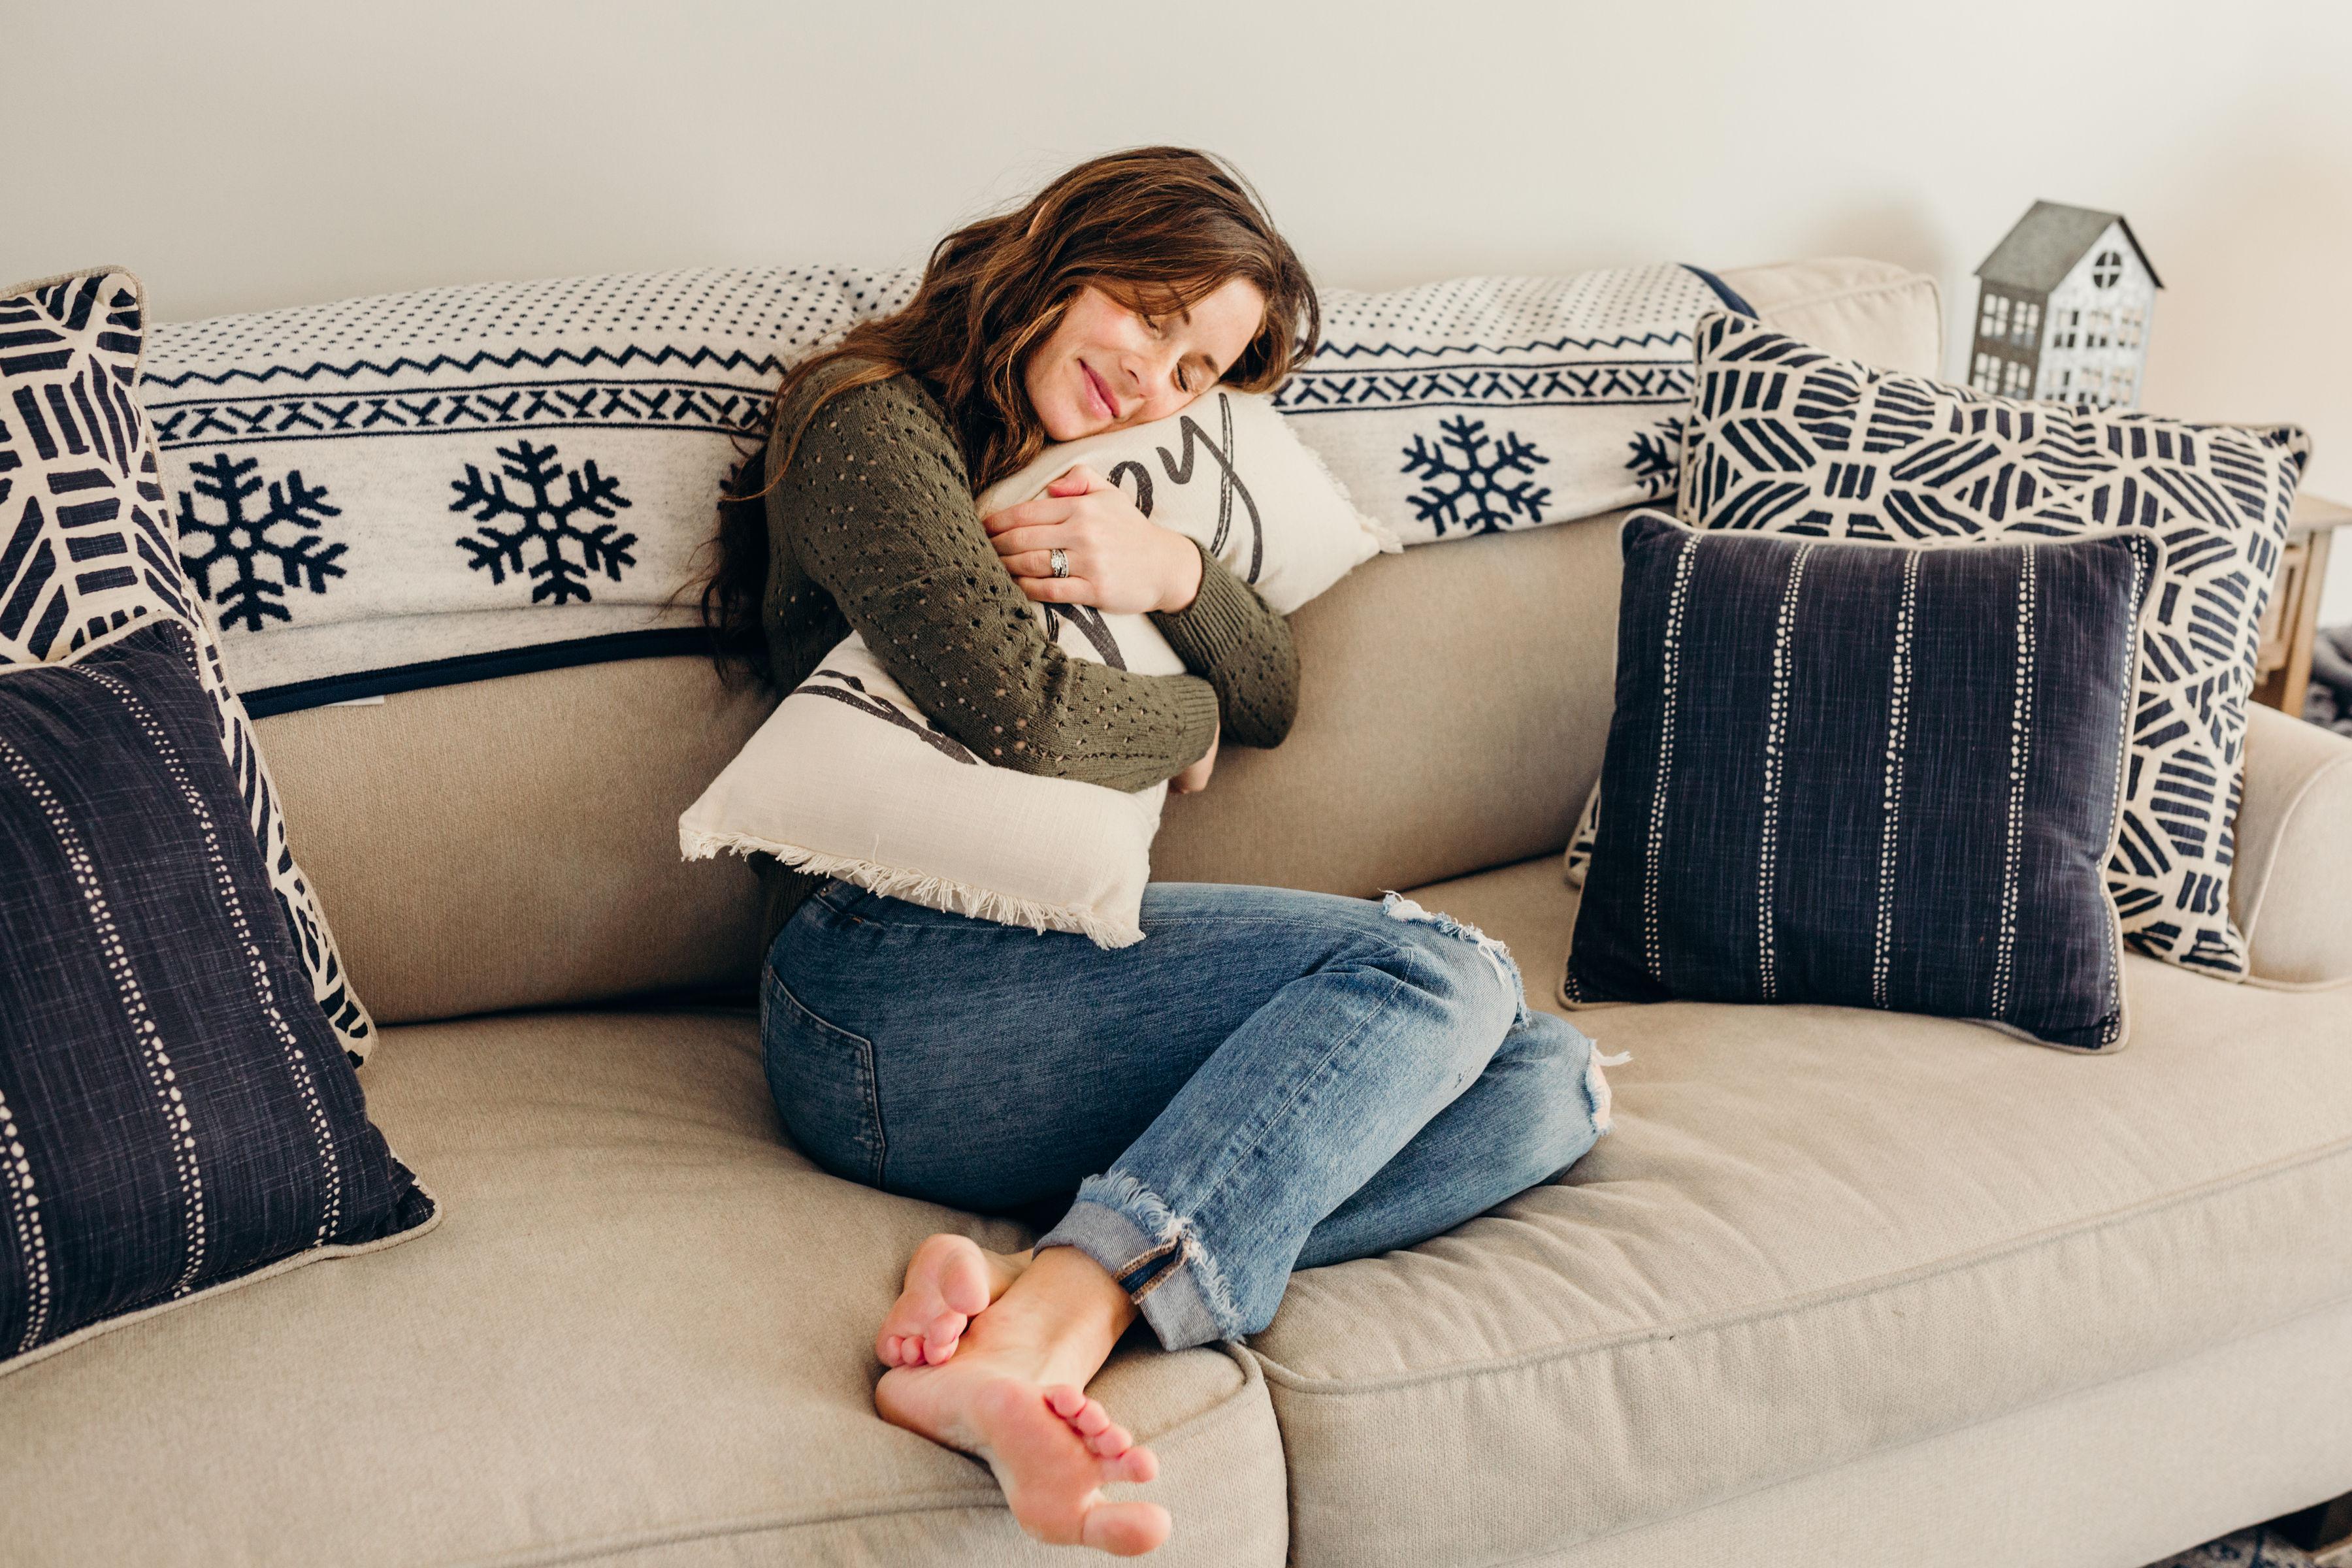 woman hugging happy pillow friday favorites